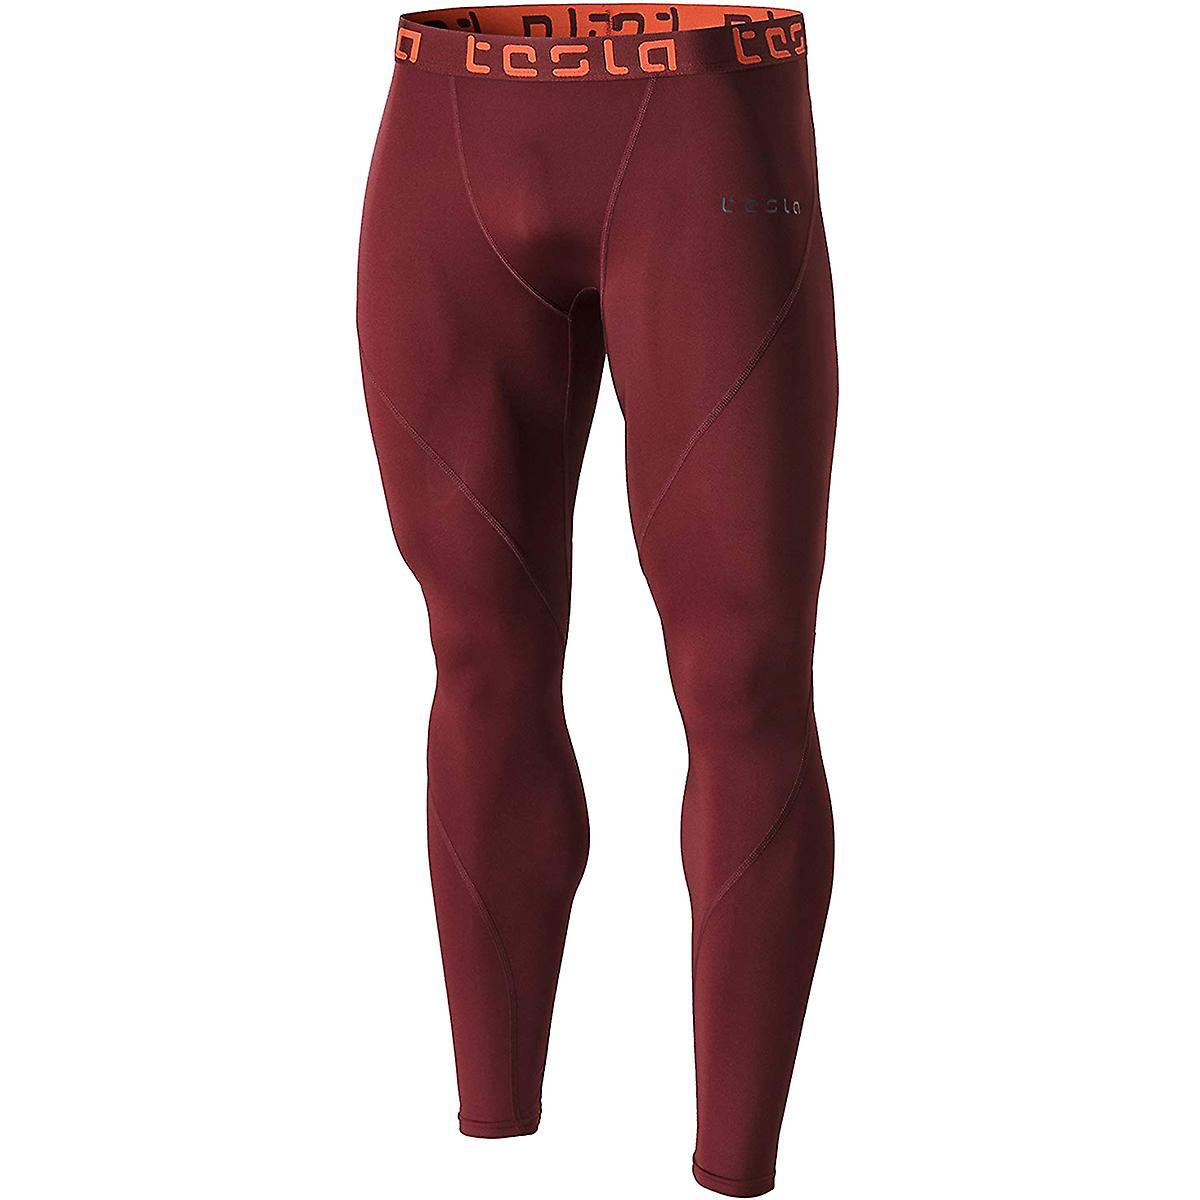 Girls Fleece Pants for Teenager Boys WYZVK22 Philippines Flag with Plane Soft//Cozy Sweatpants